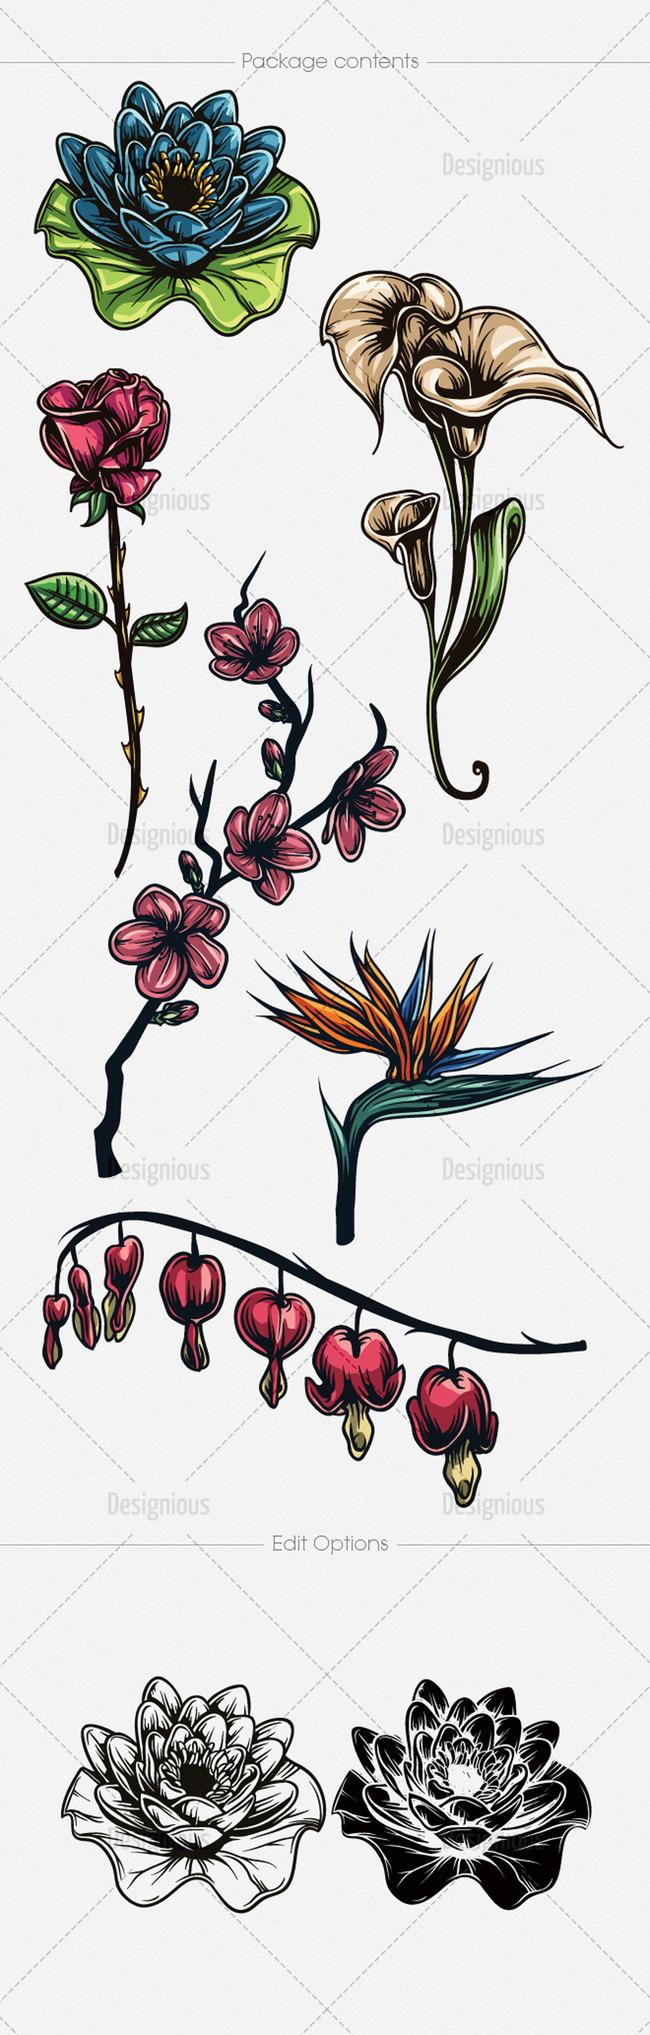 t恤图案 时尚花朵 矢量花朵 玻璃花 移门图案 陶瓷花朵 陶瓷花纸 印刷